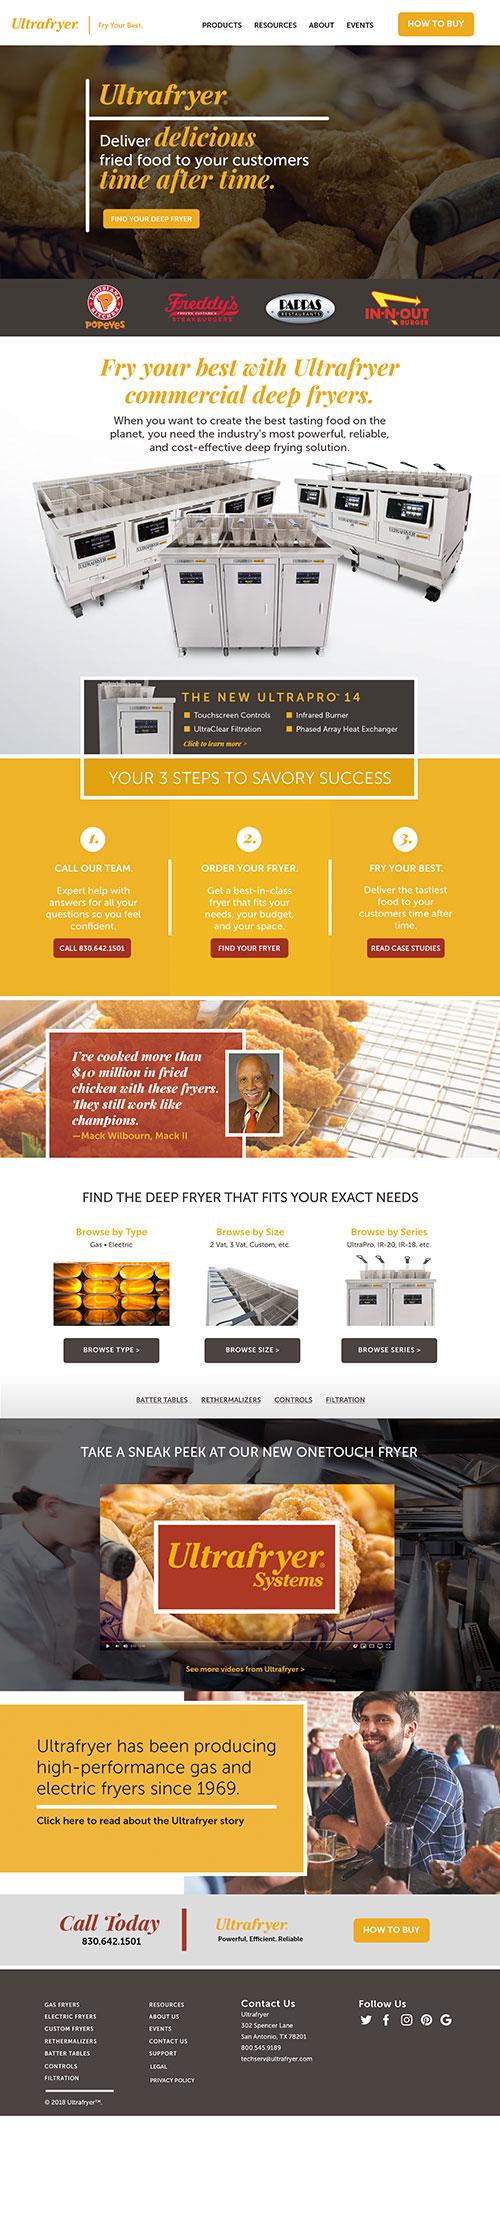 Ultrafryer Homepage